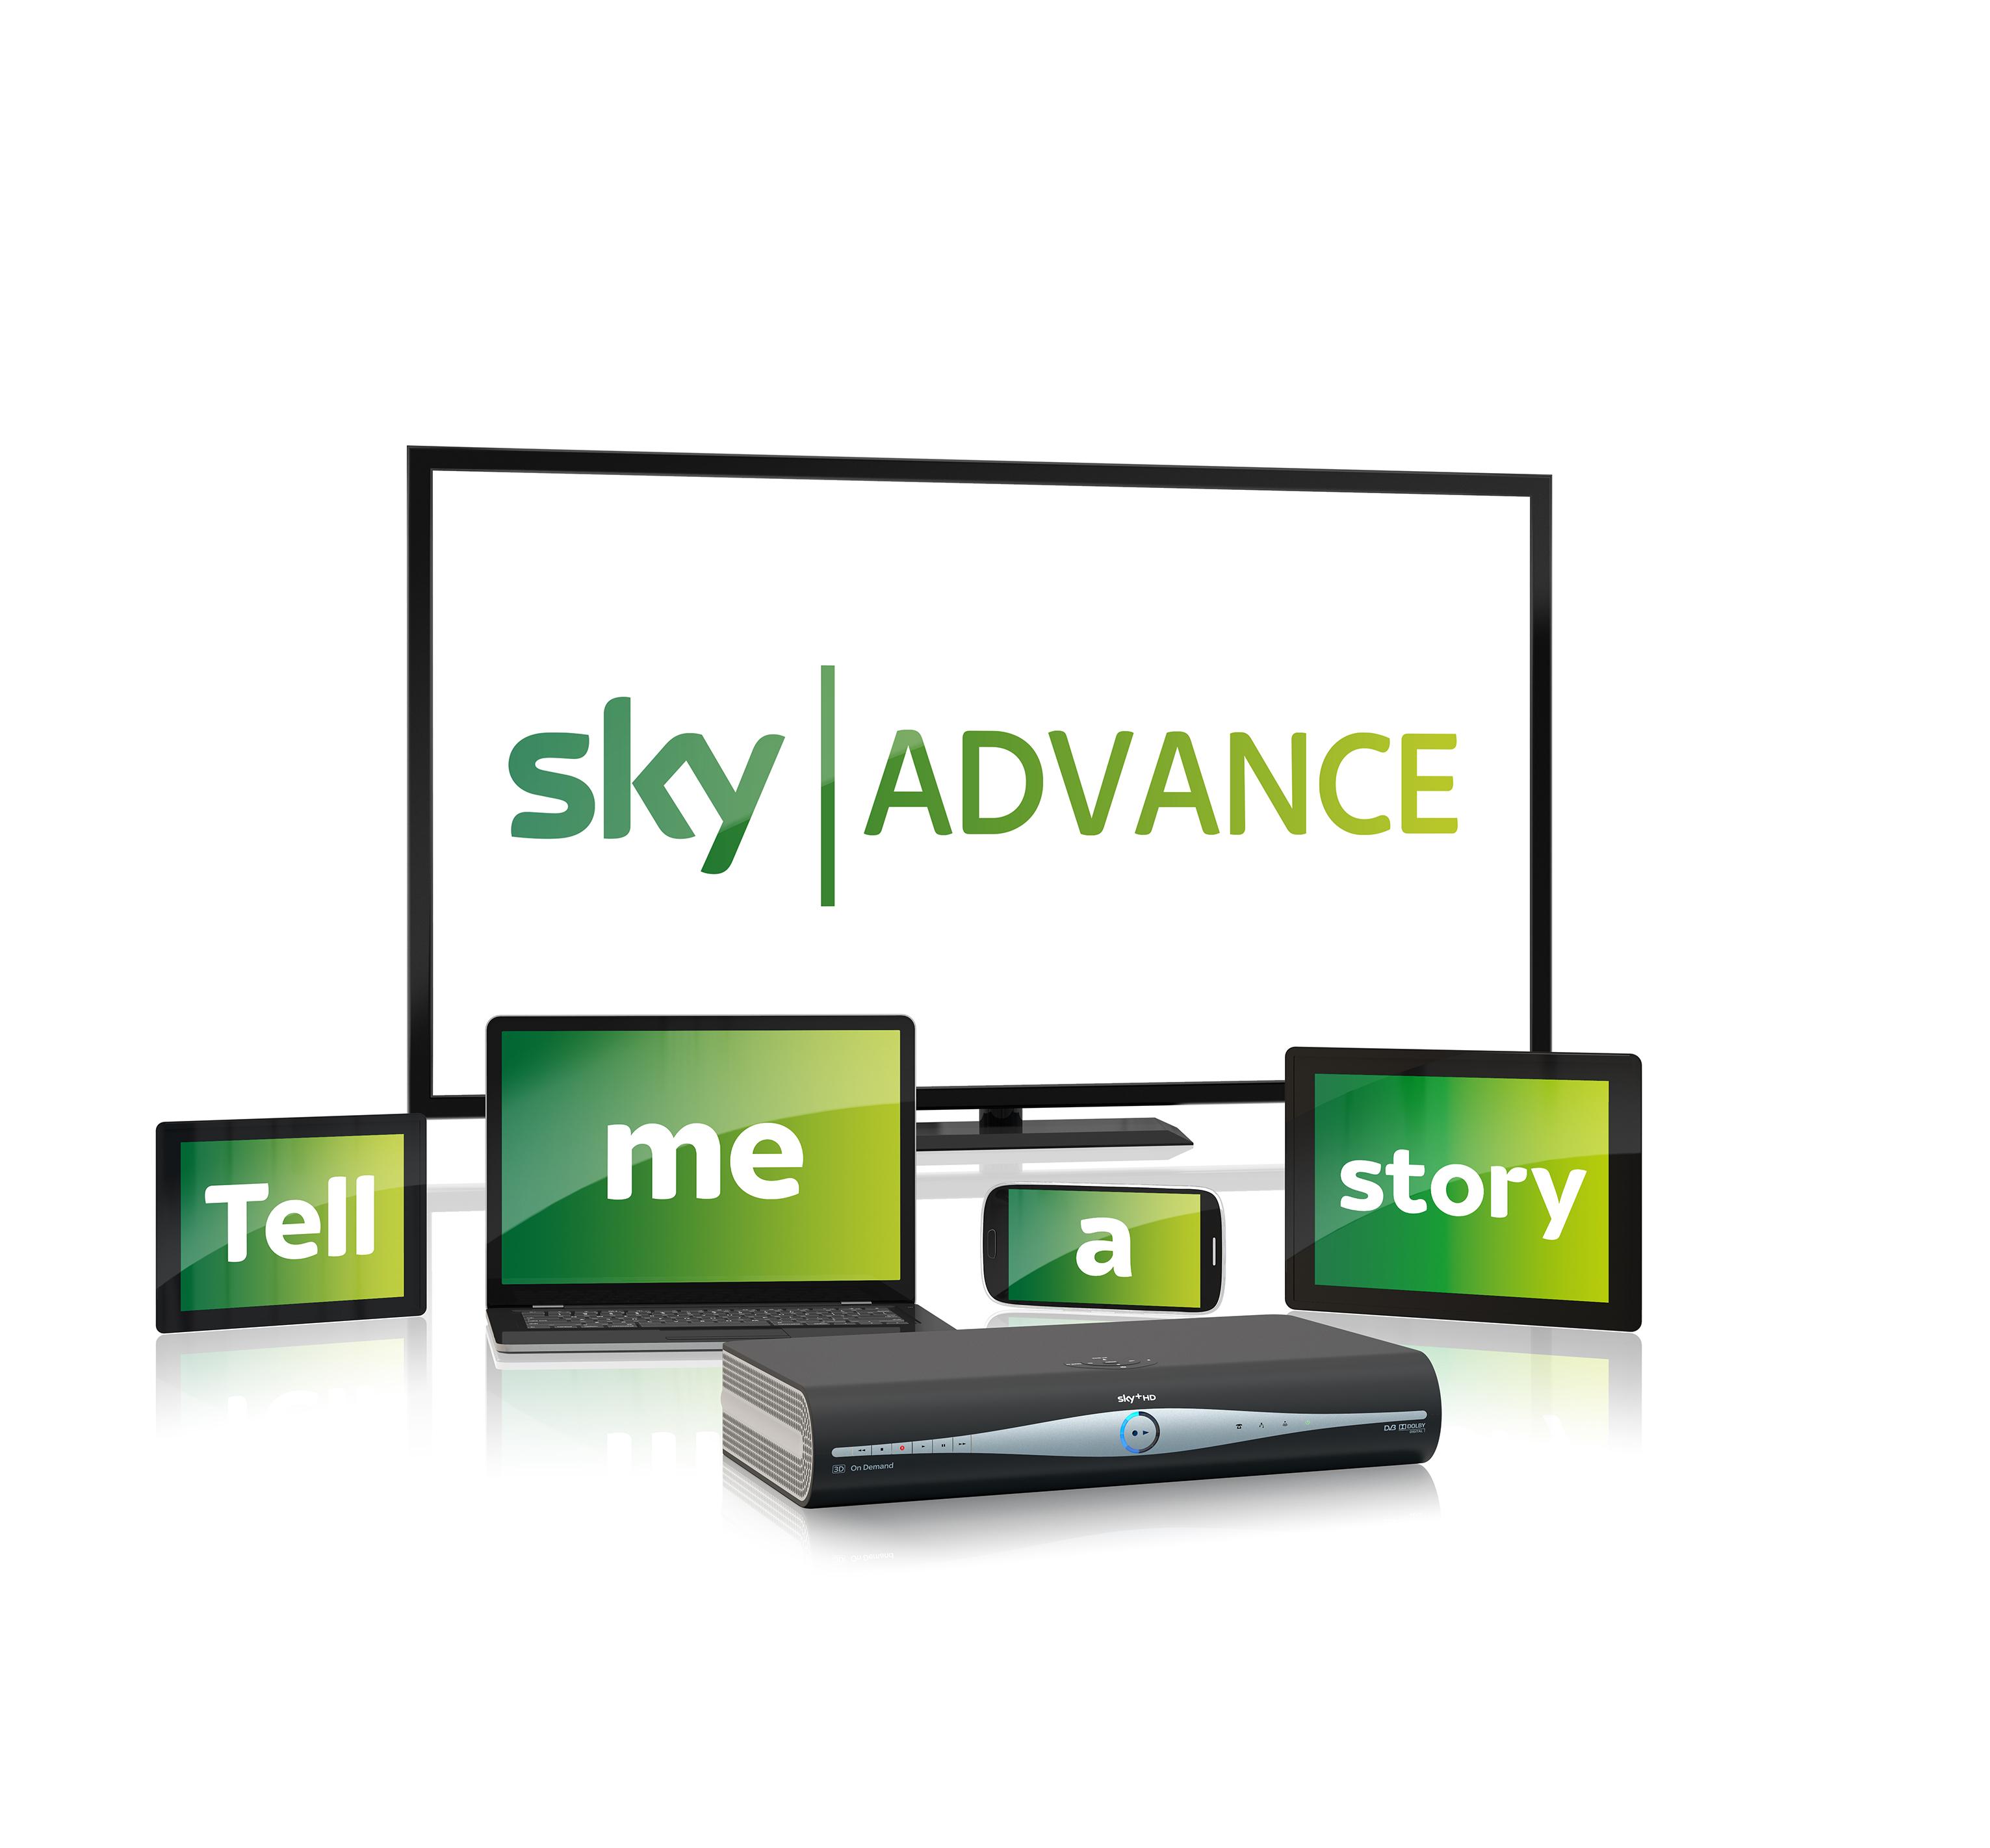 Sky AdVance